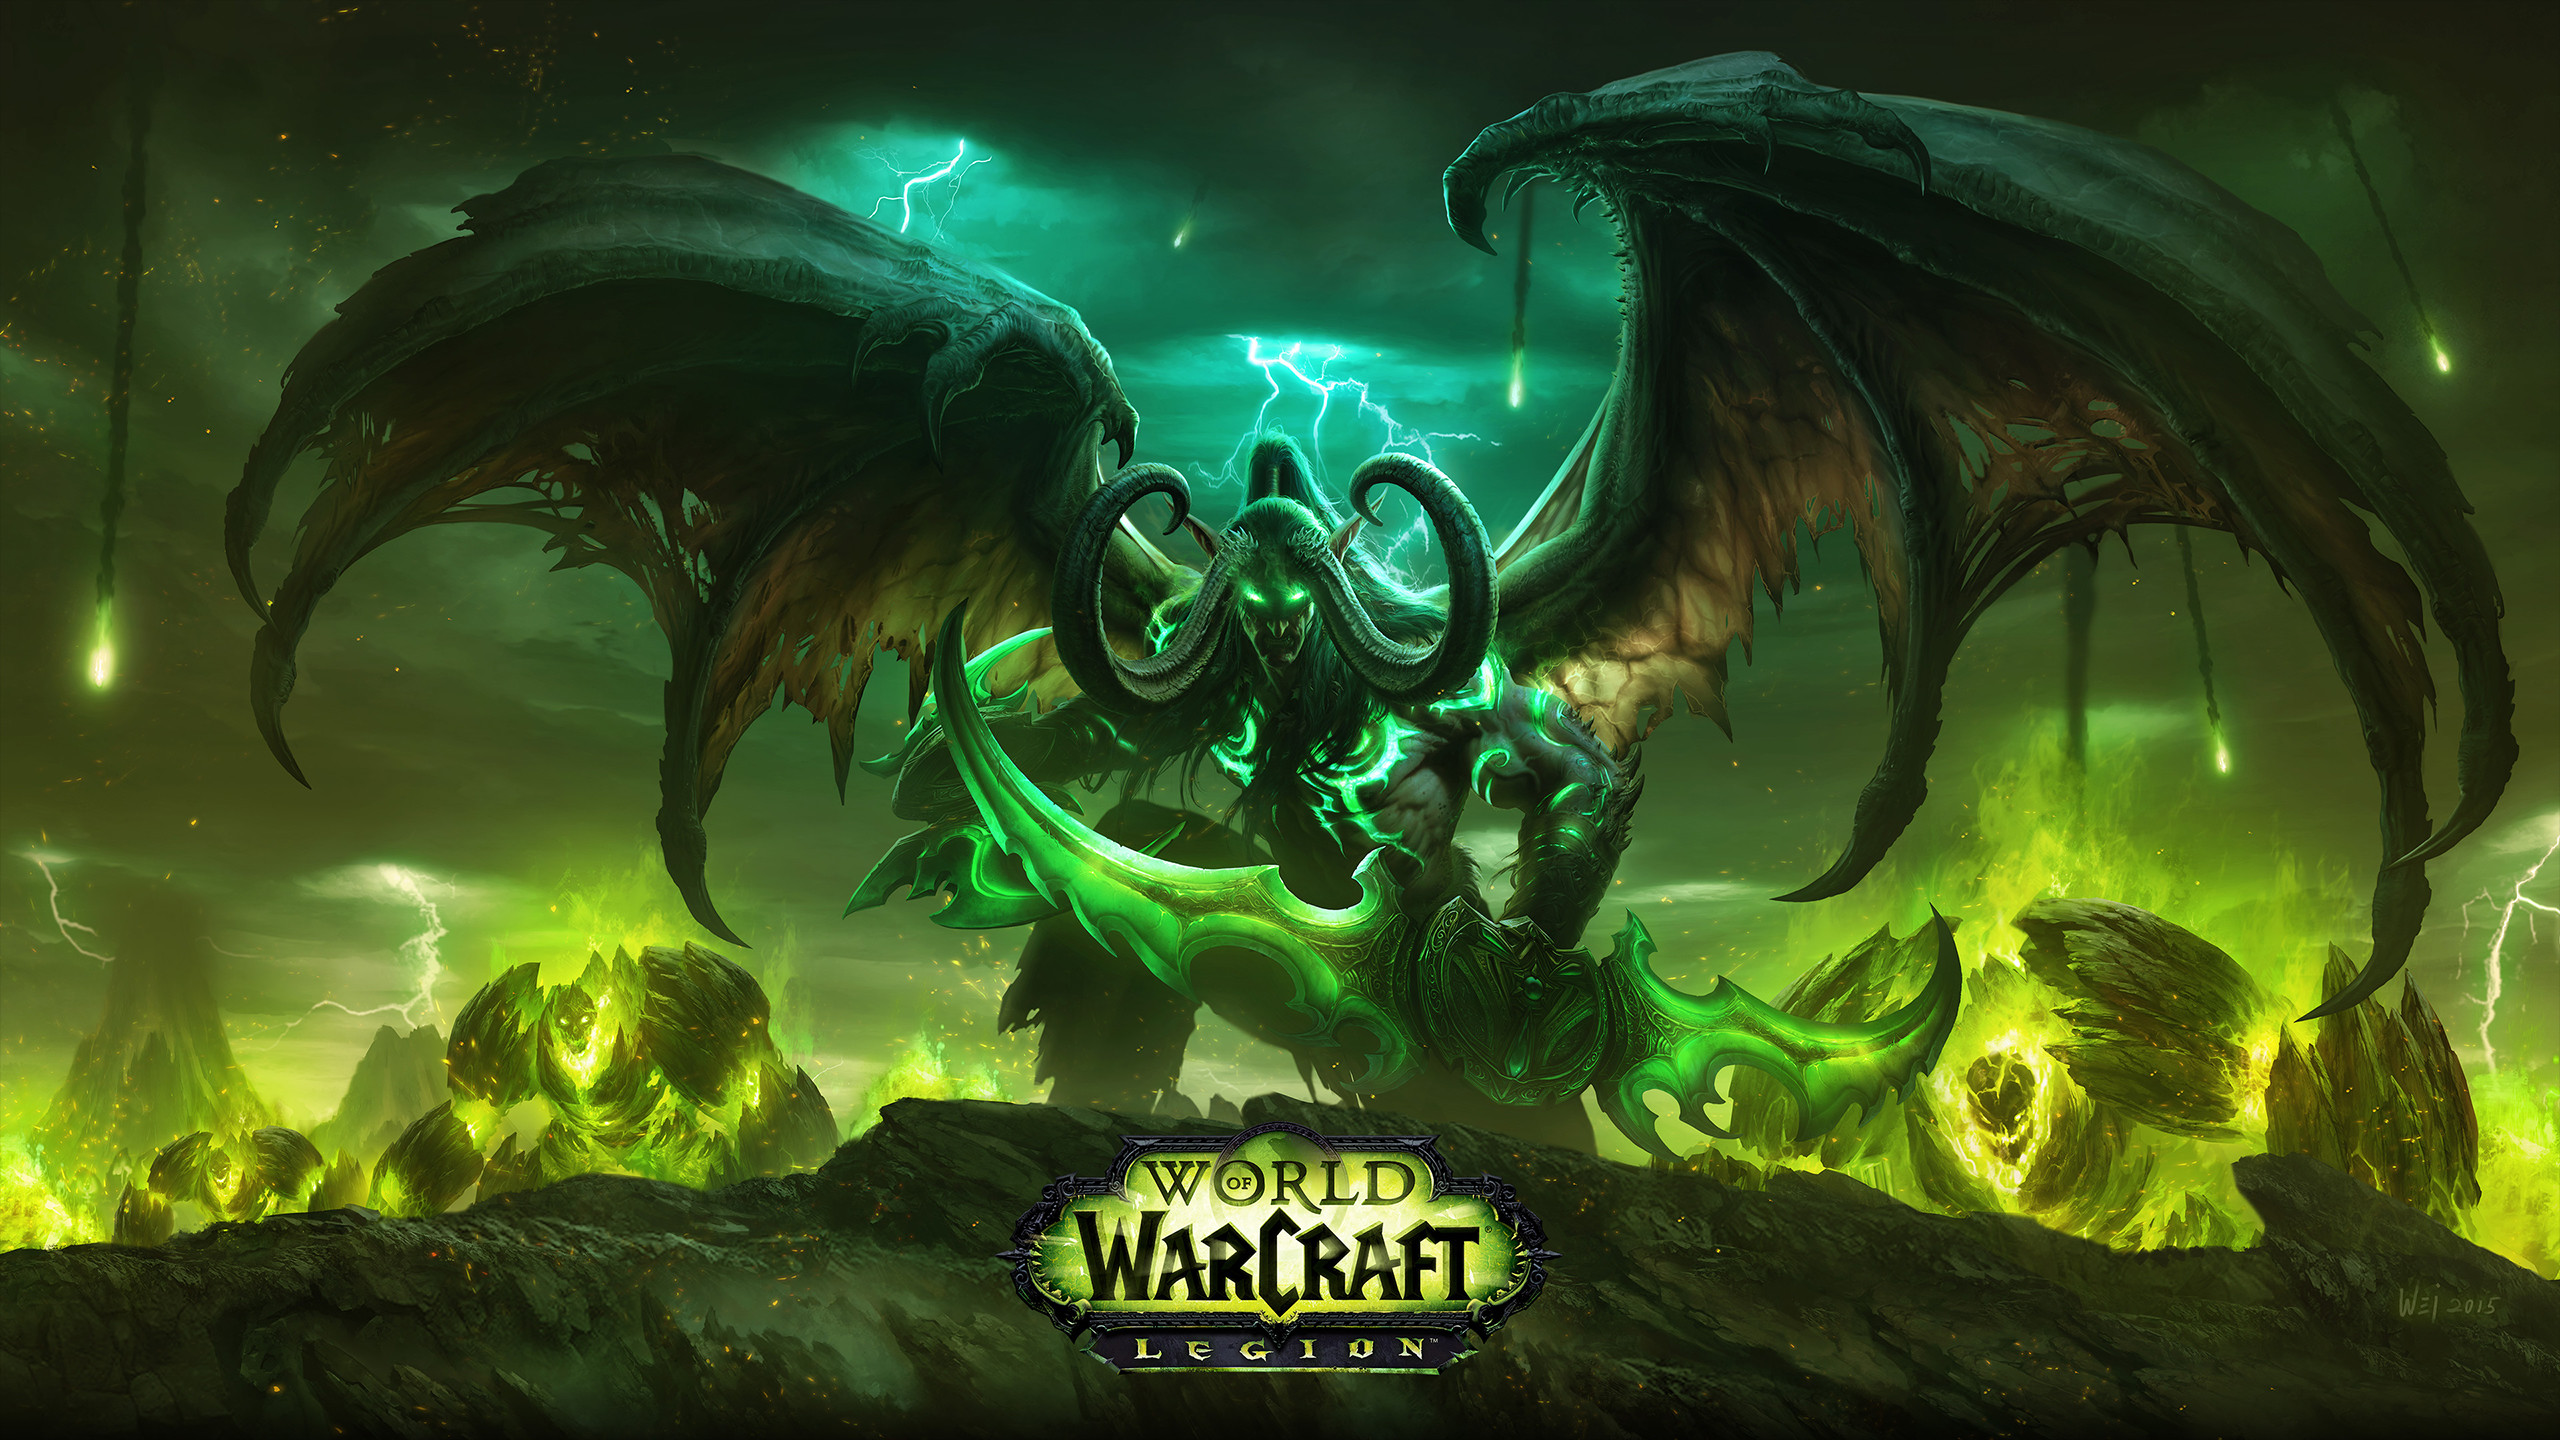 2560x1440 World of Warcraft®